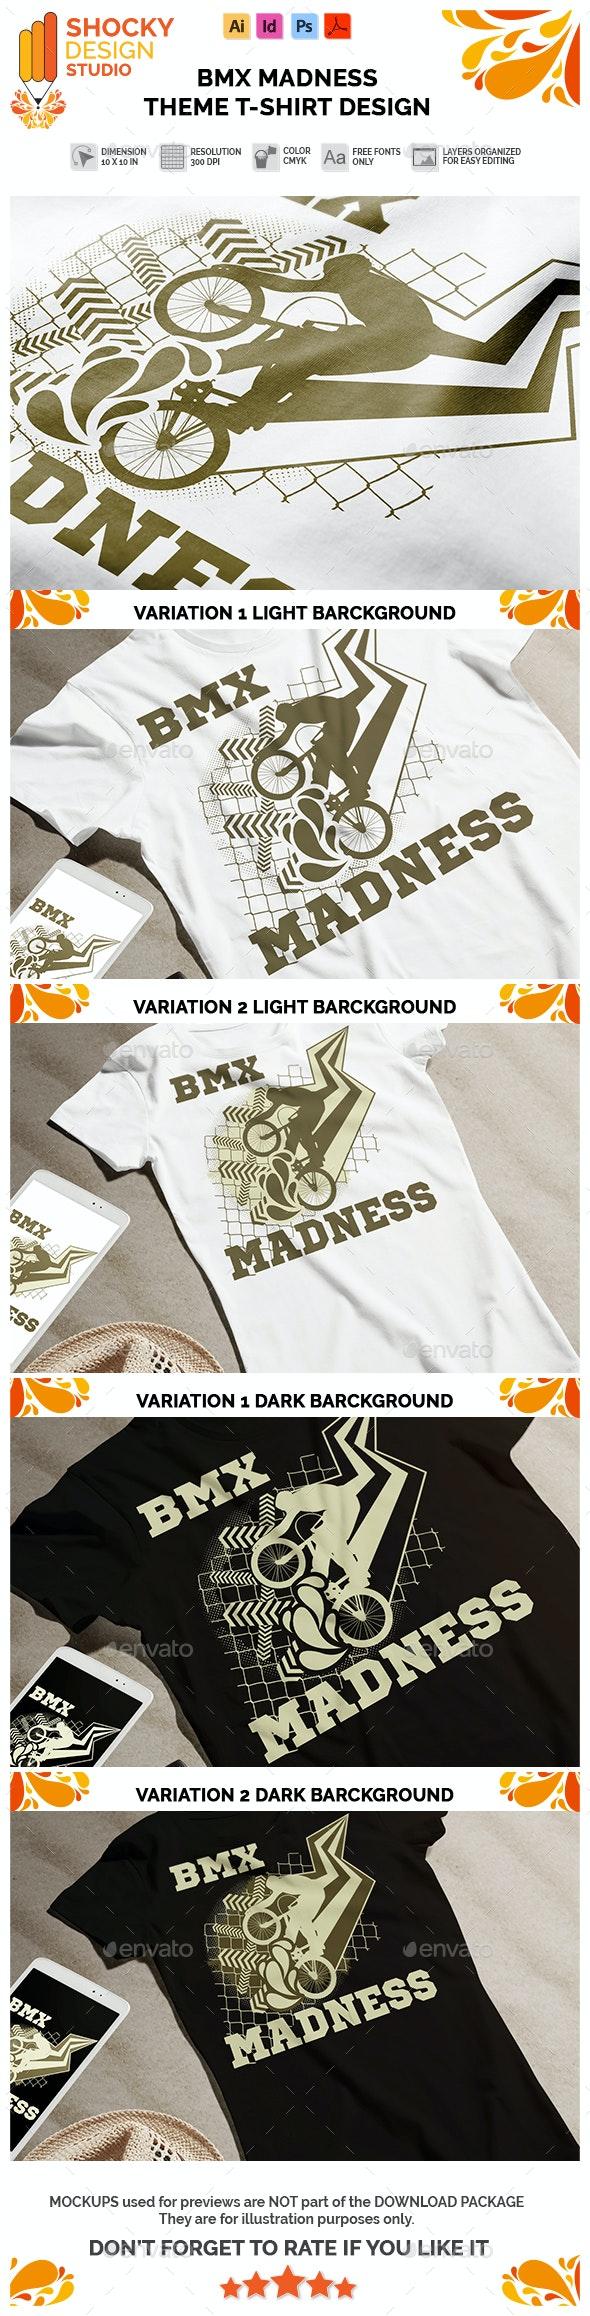 BMX Madness Theme T-shirt Design